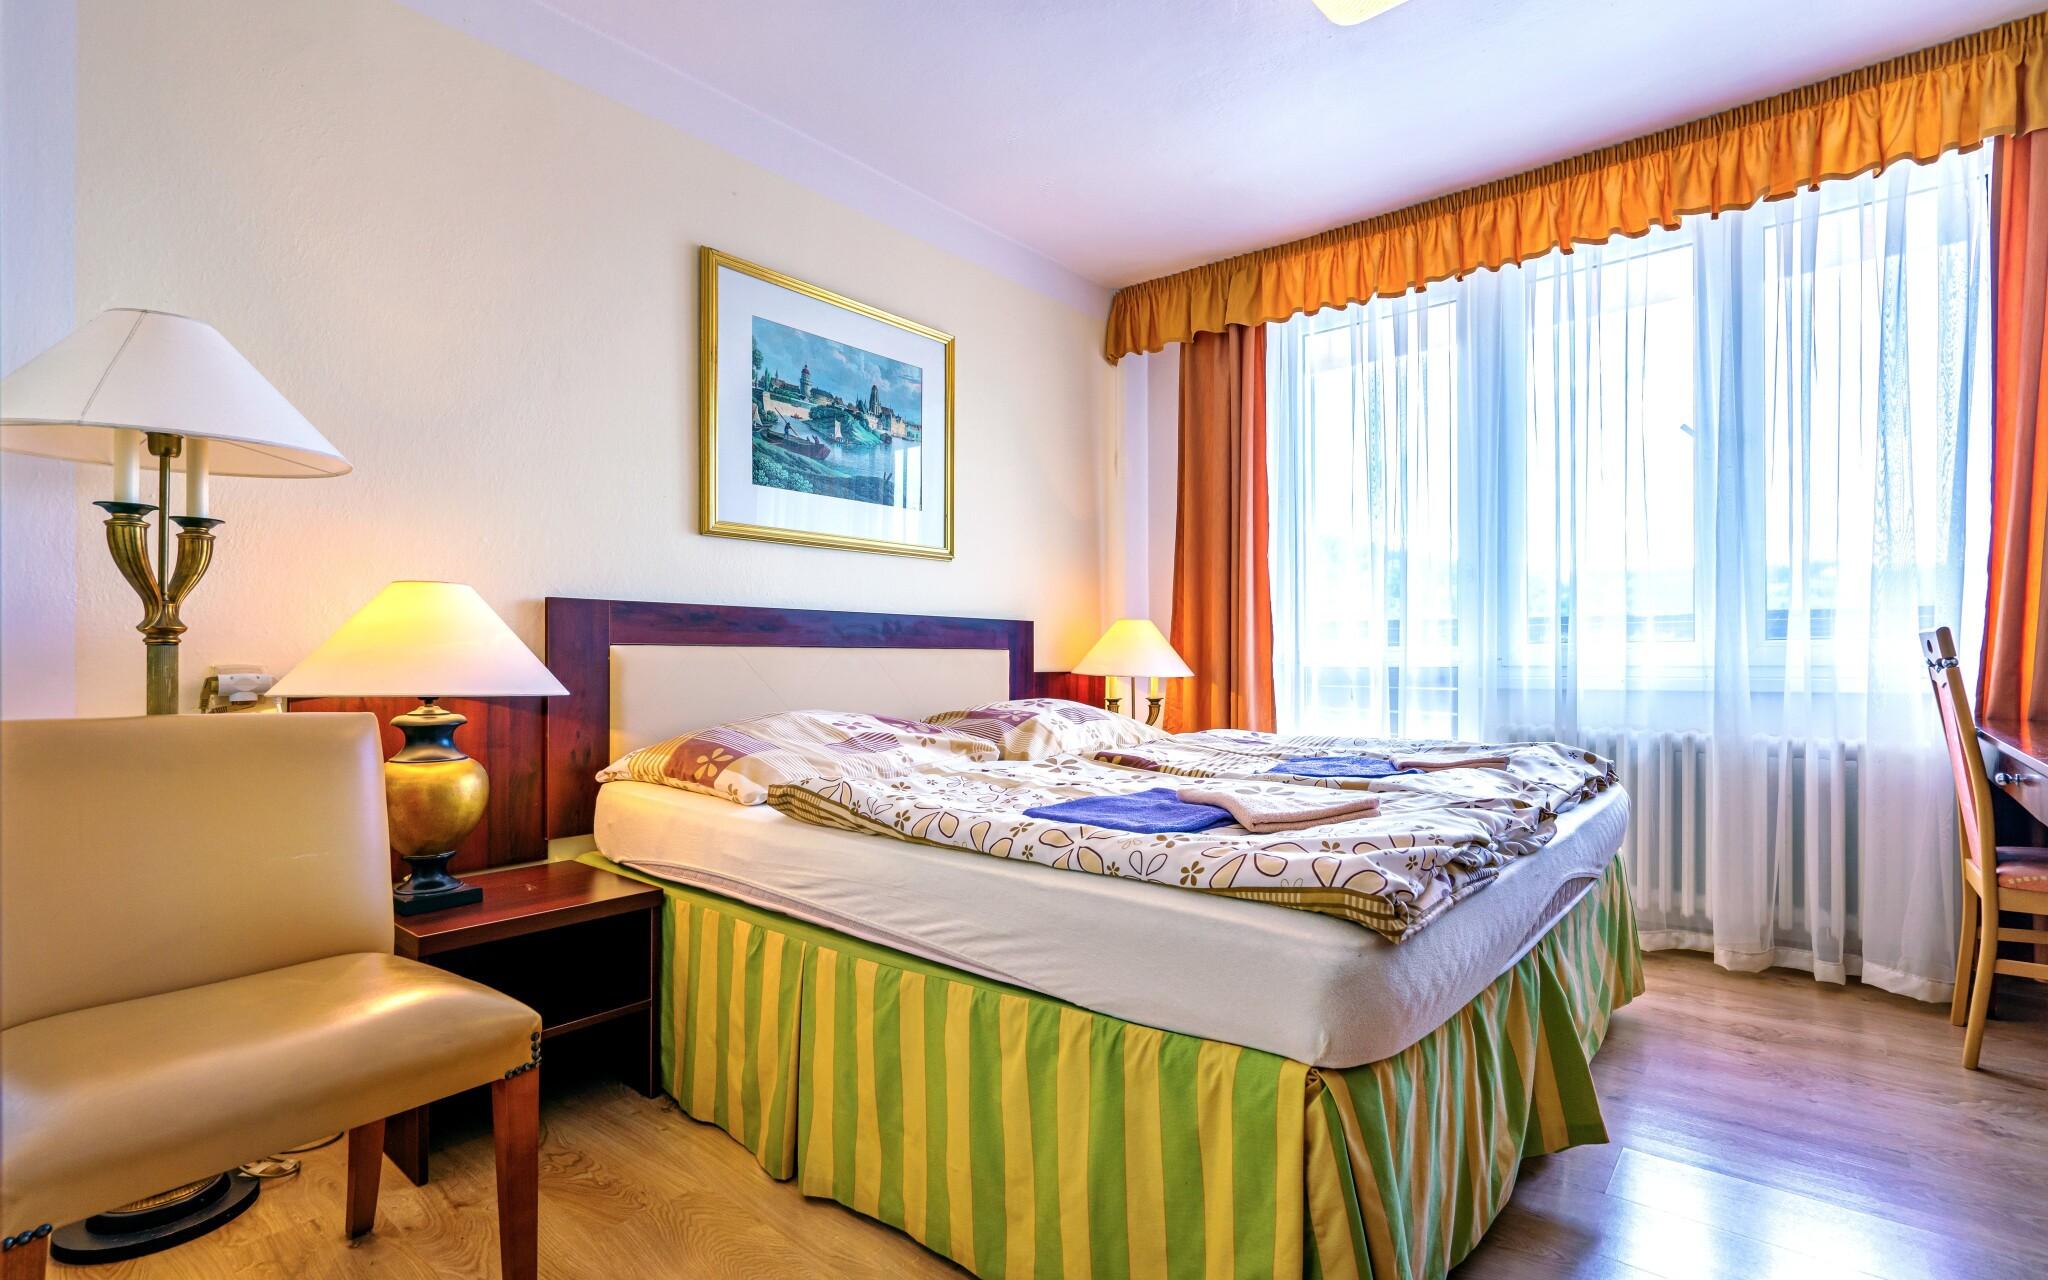 Pokoje, Hotel Petr Bezruč, Beskydy